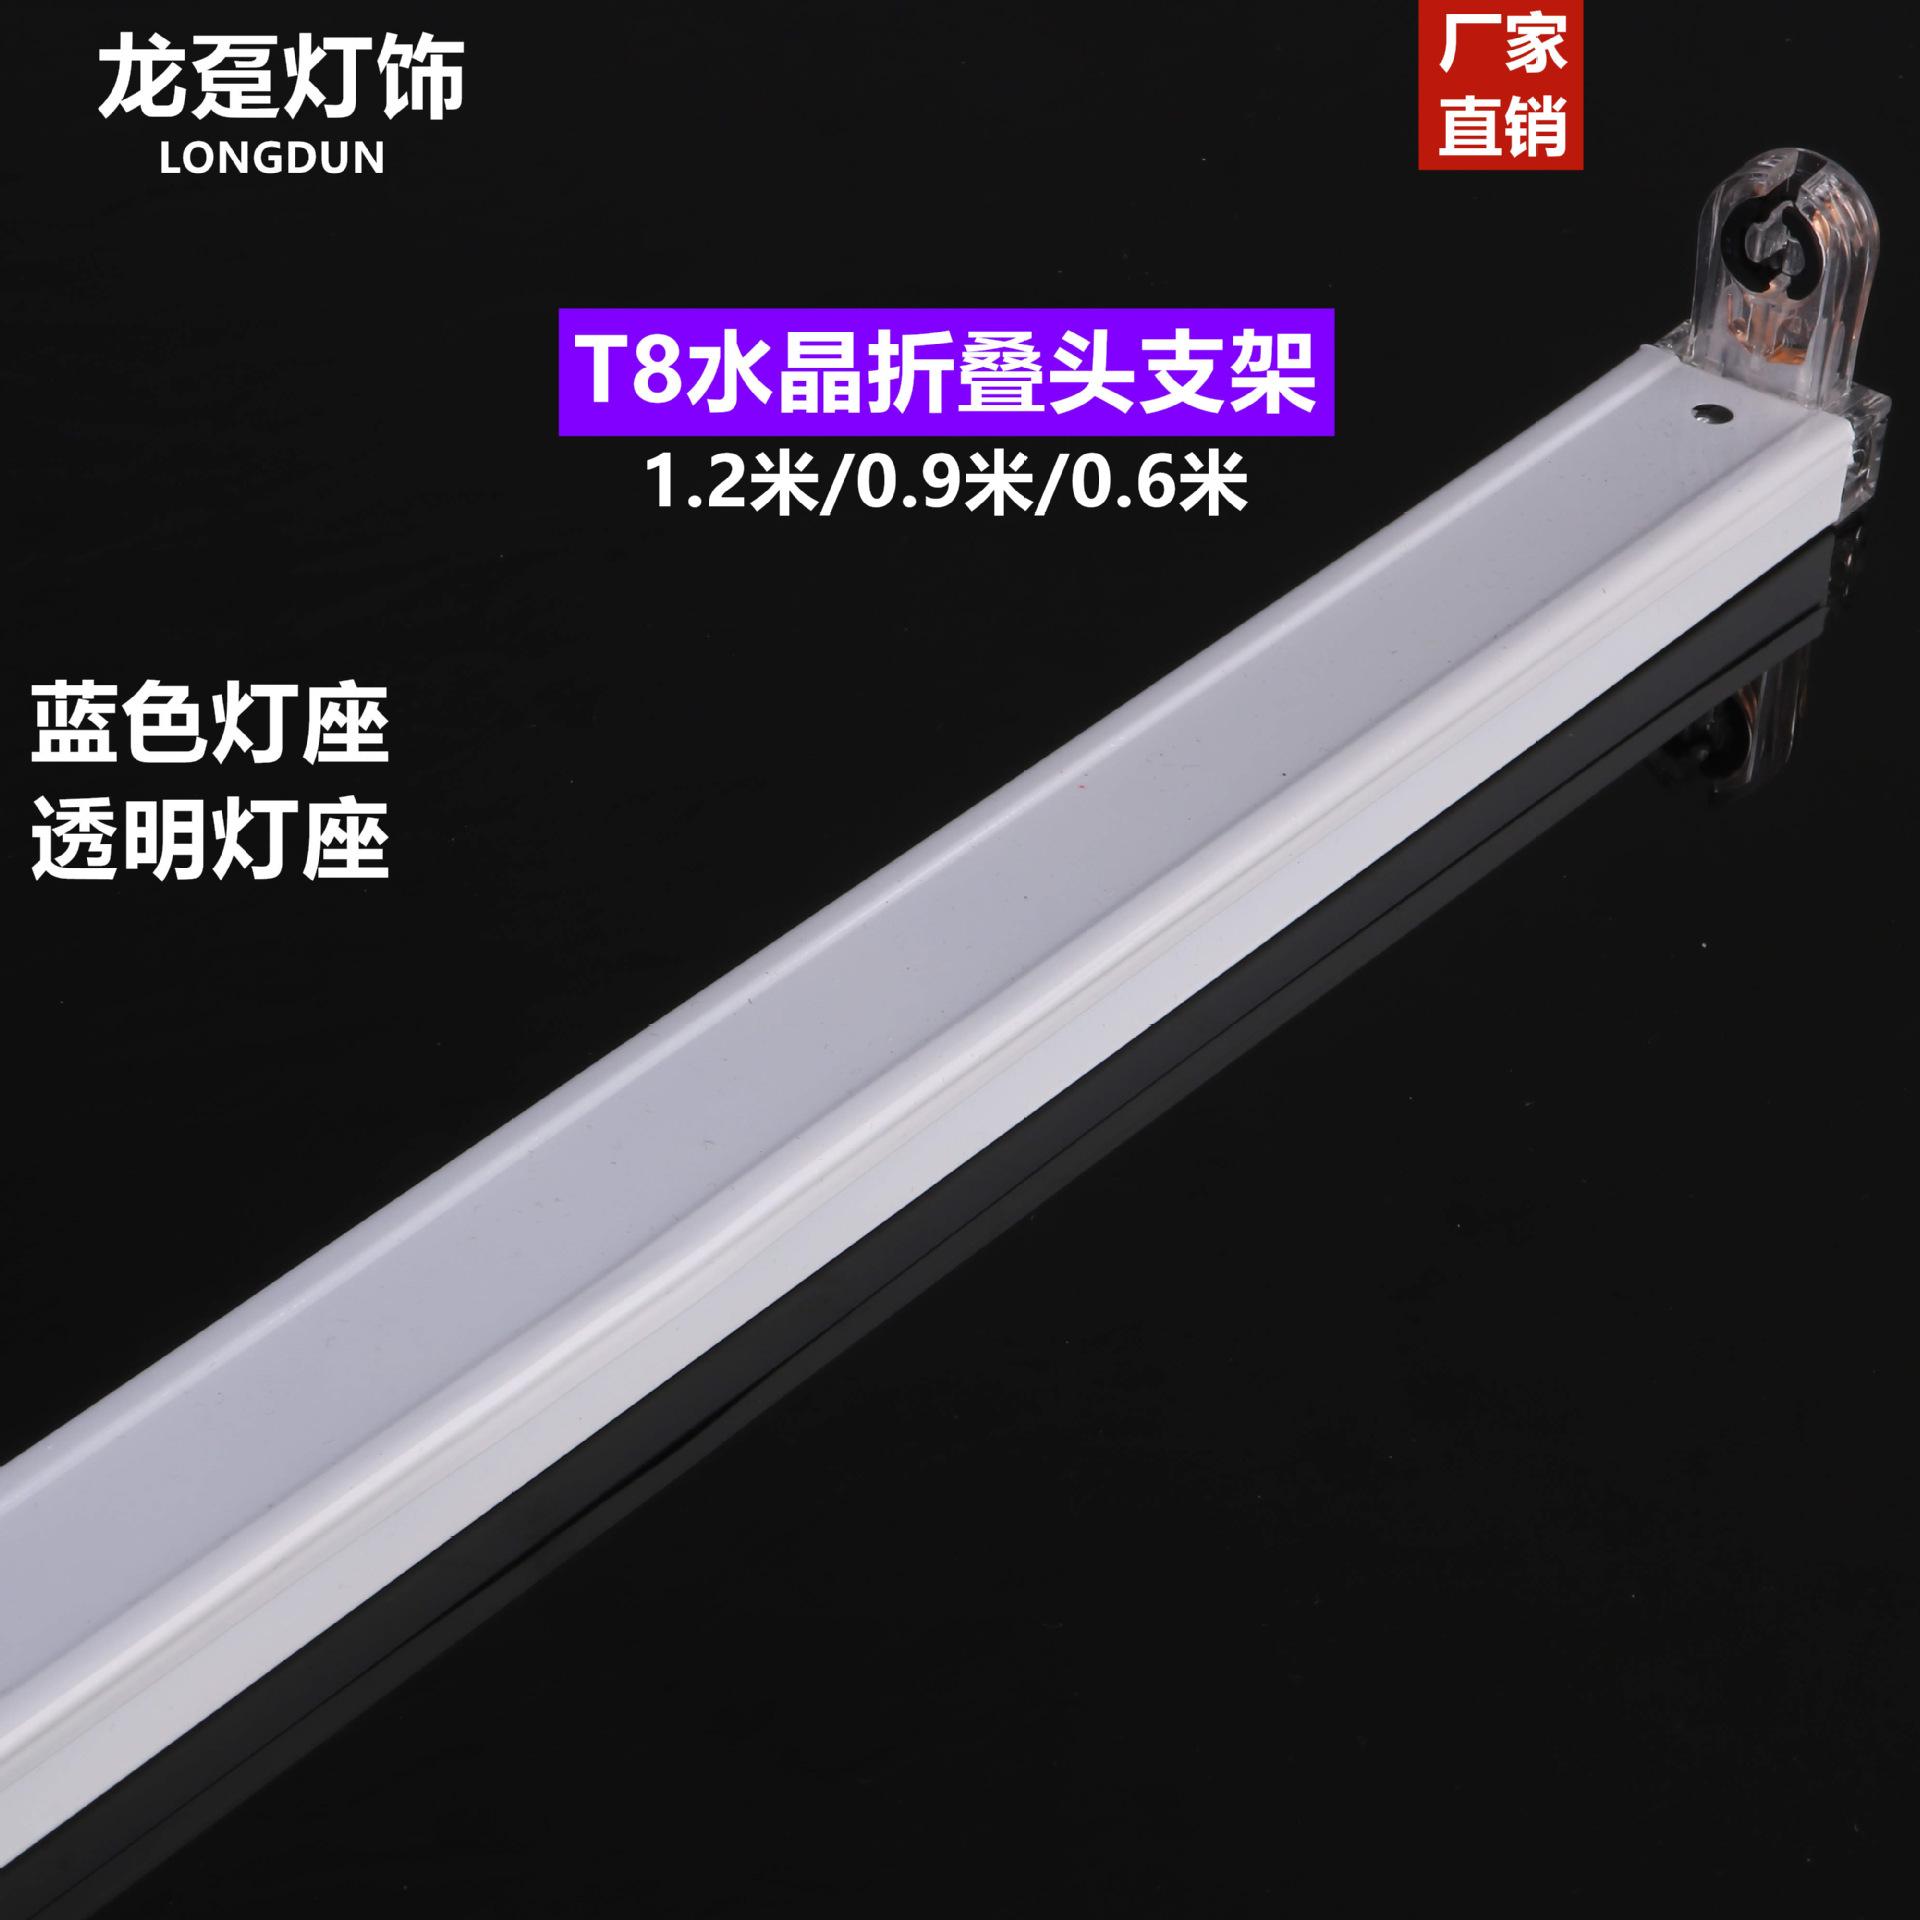 T8水晶头支架蓝色头 透明头支架T8折叠头支架LEDT8支架灯